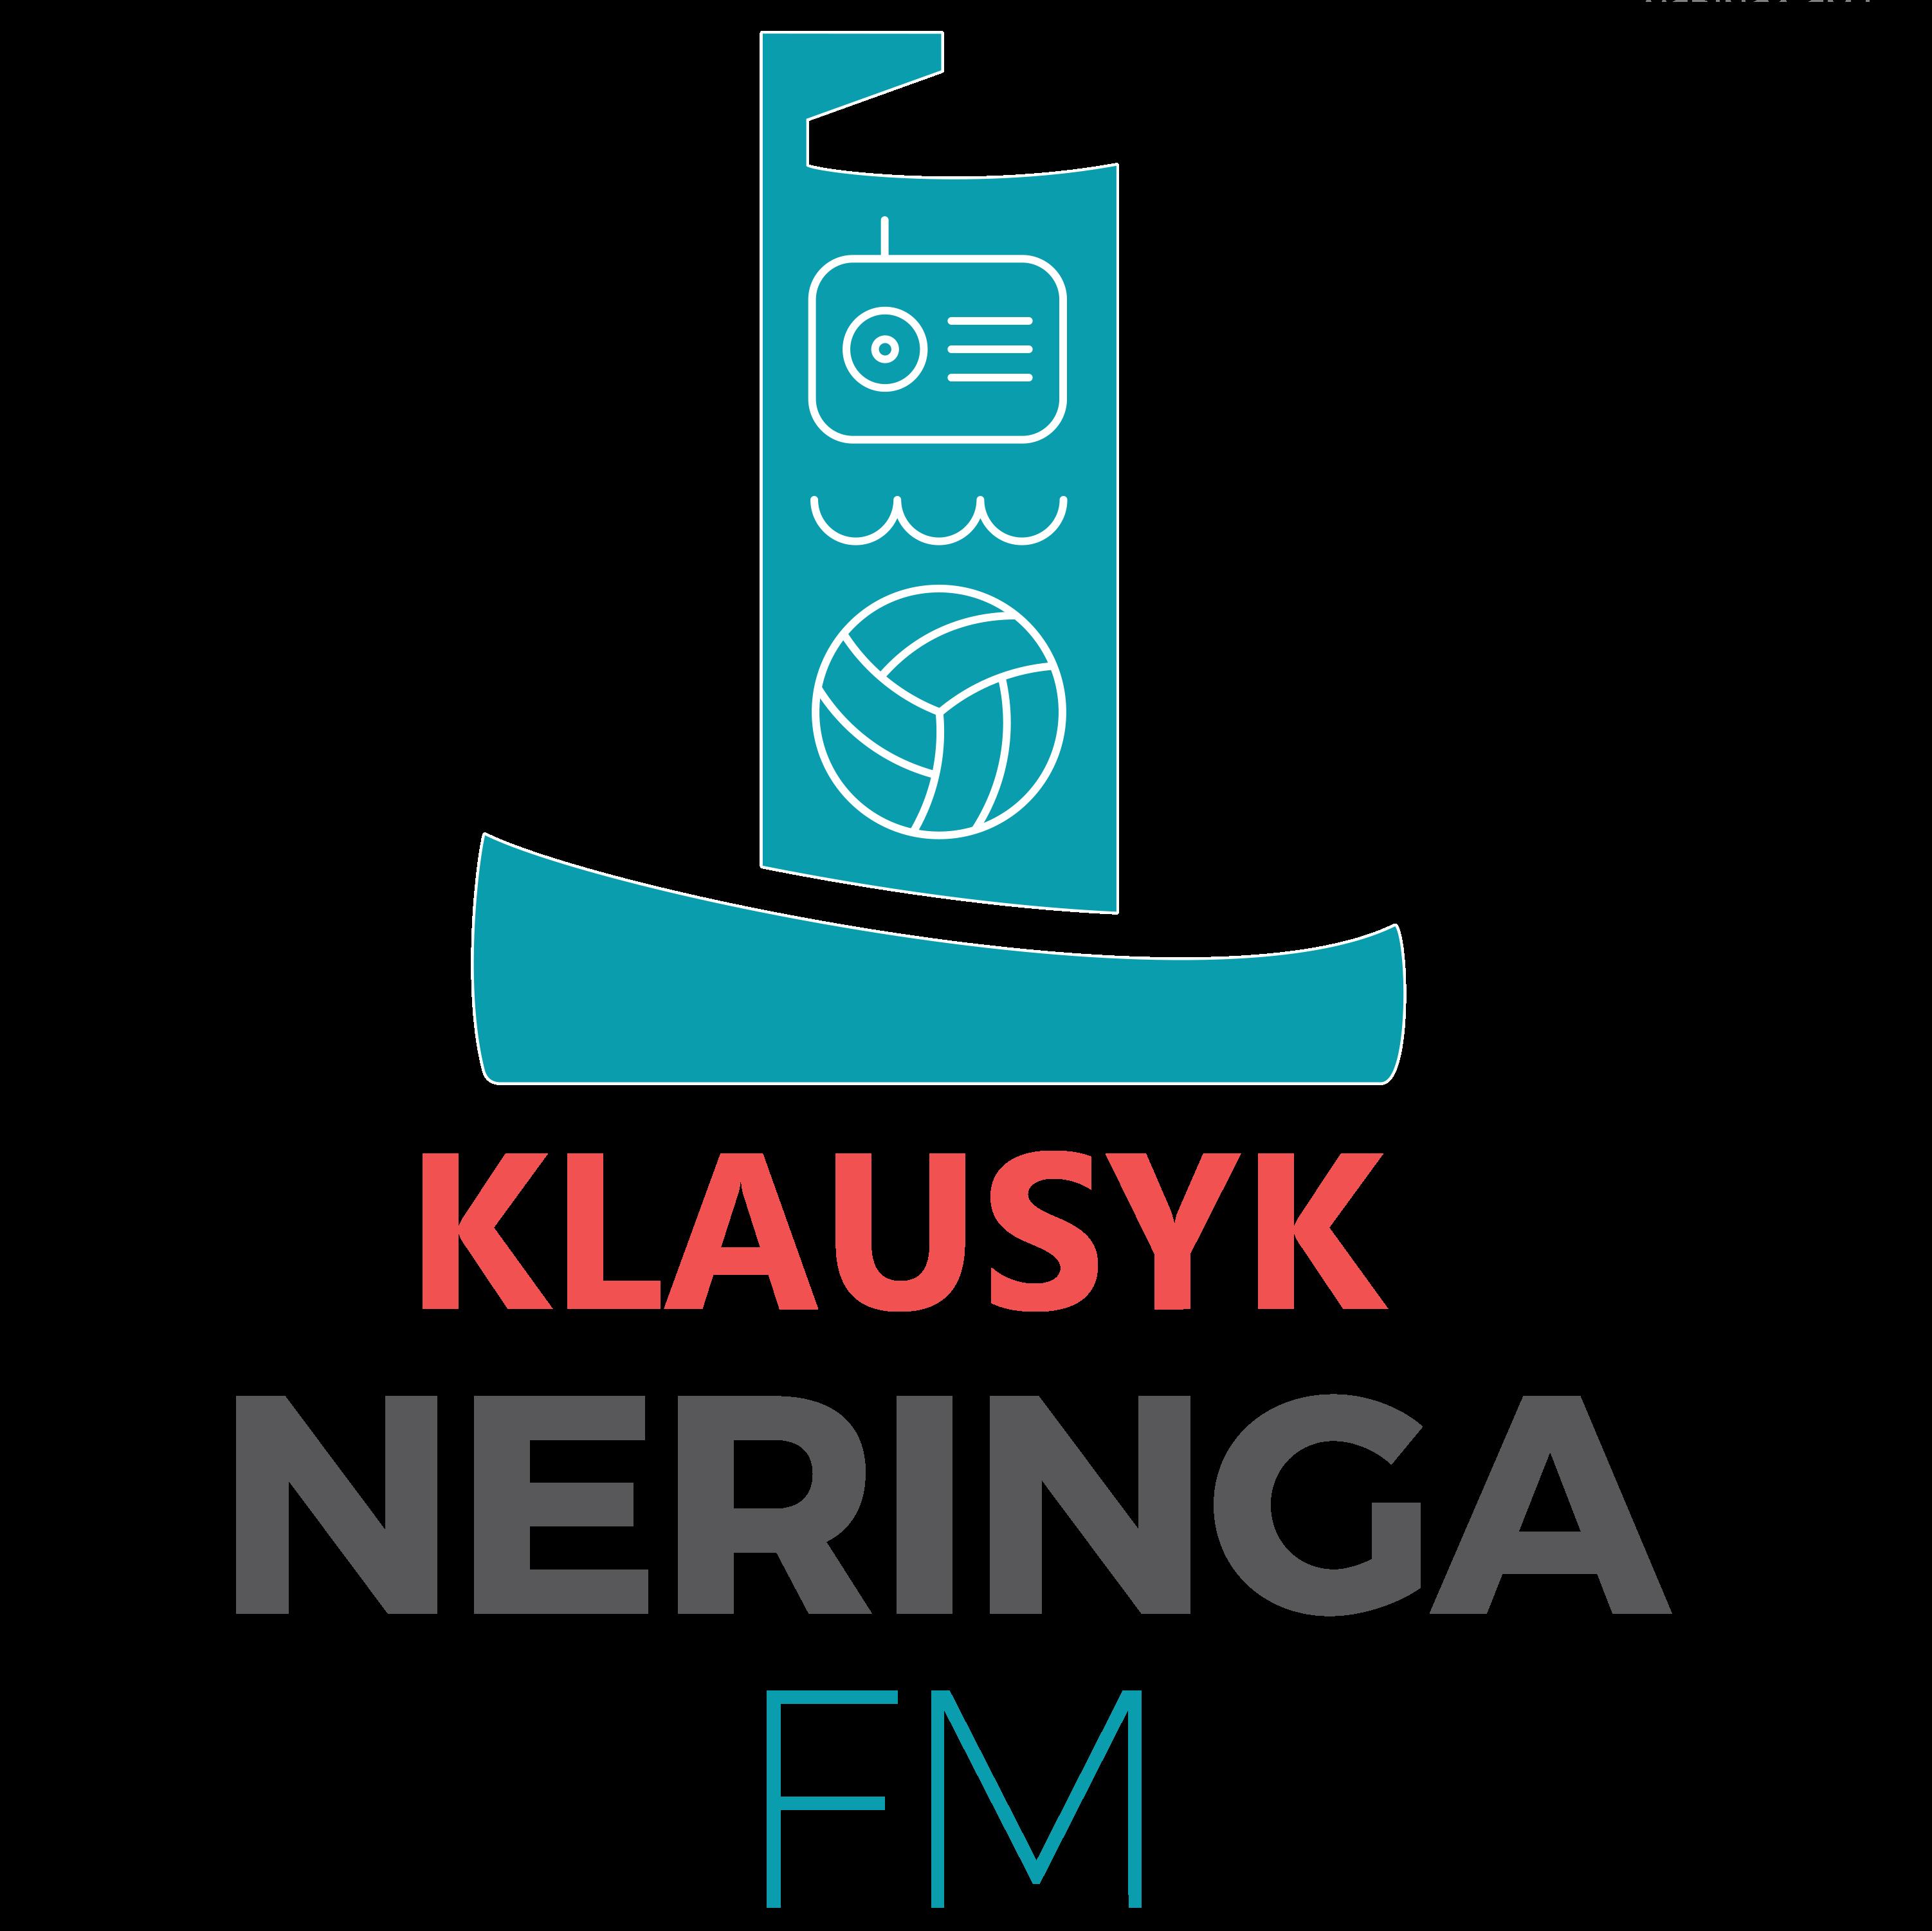 listen-to-neringa-fm